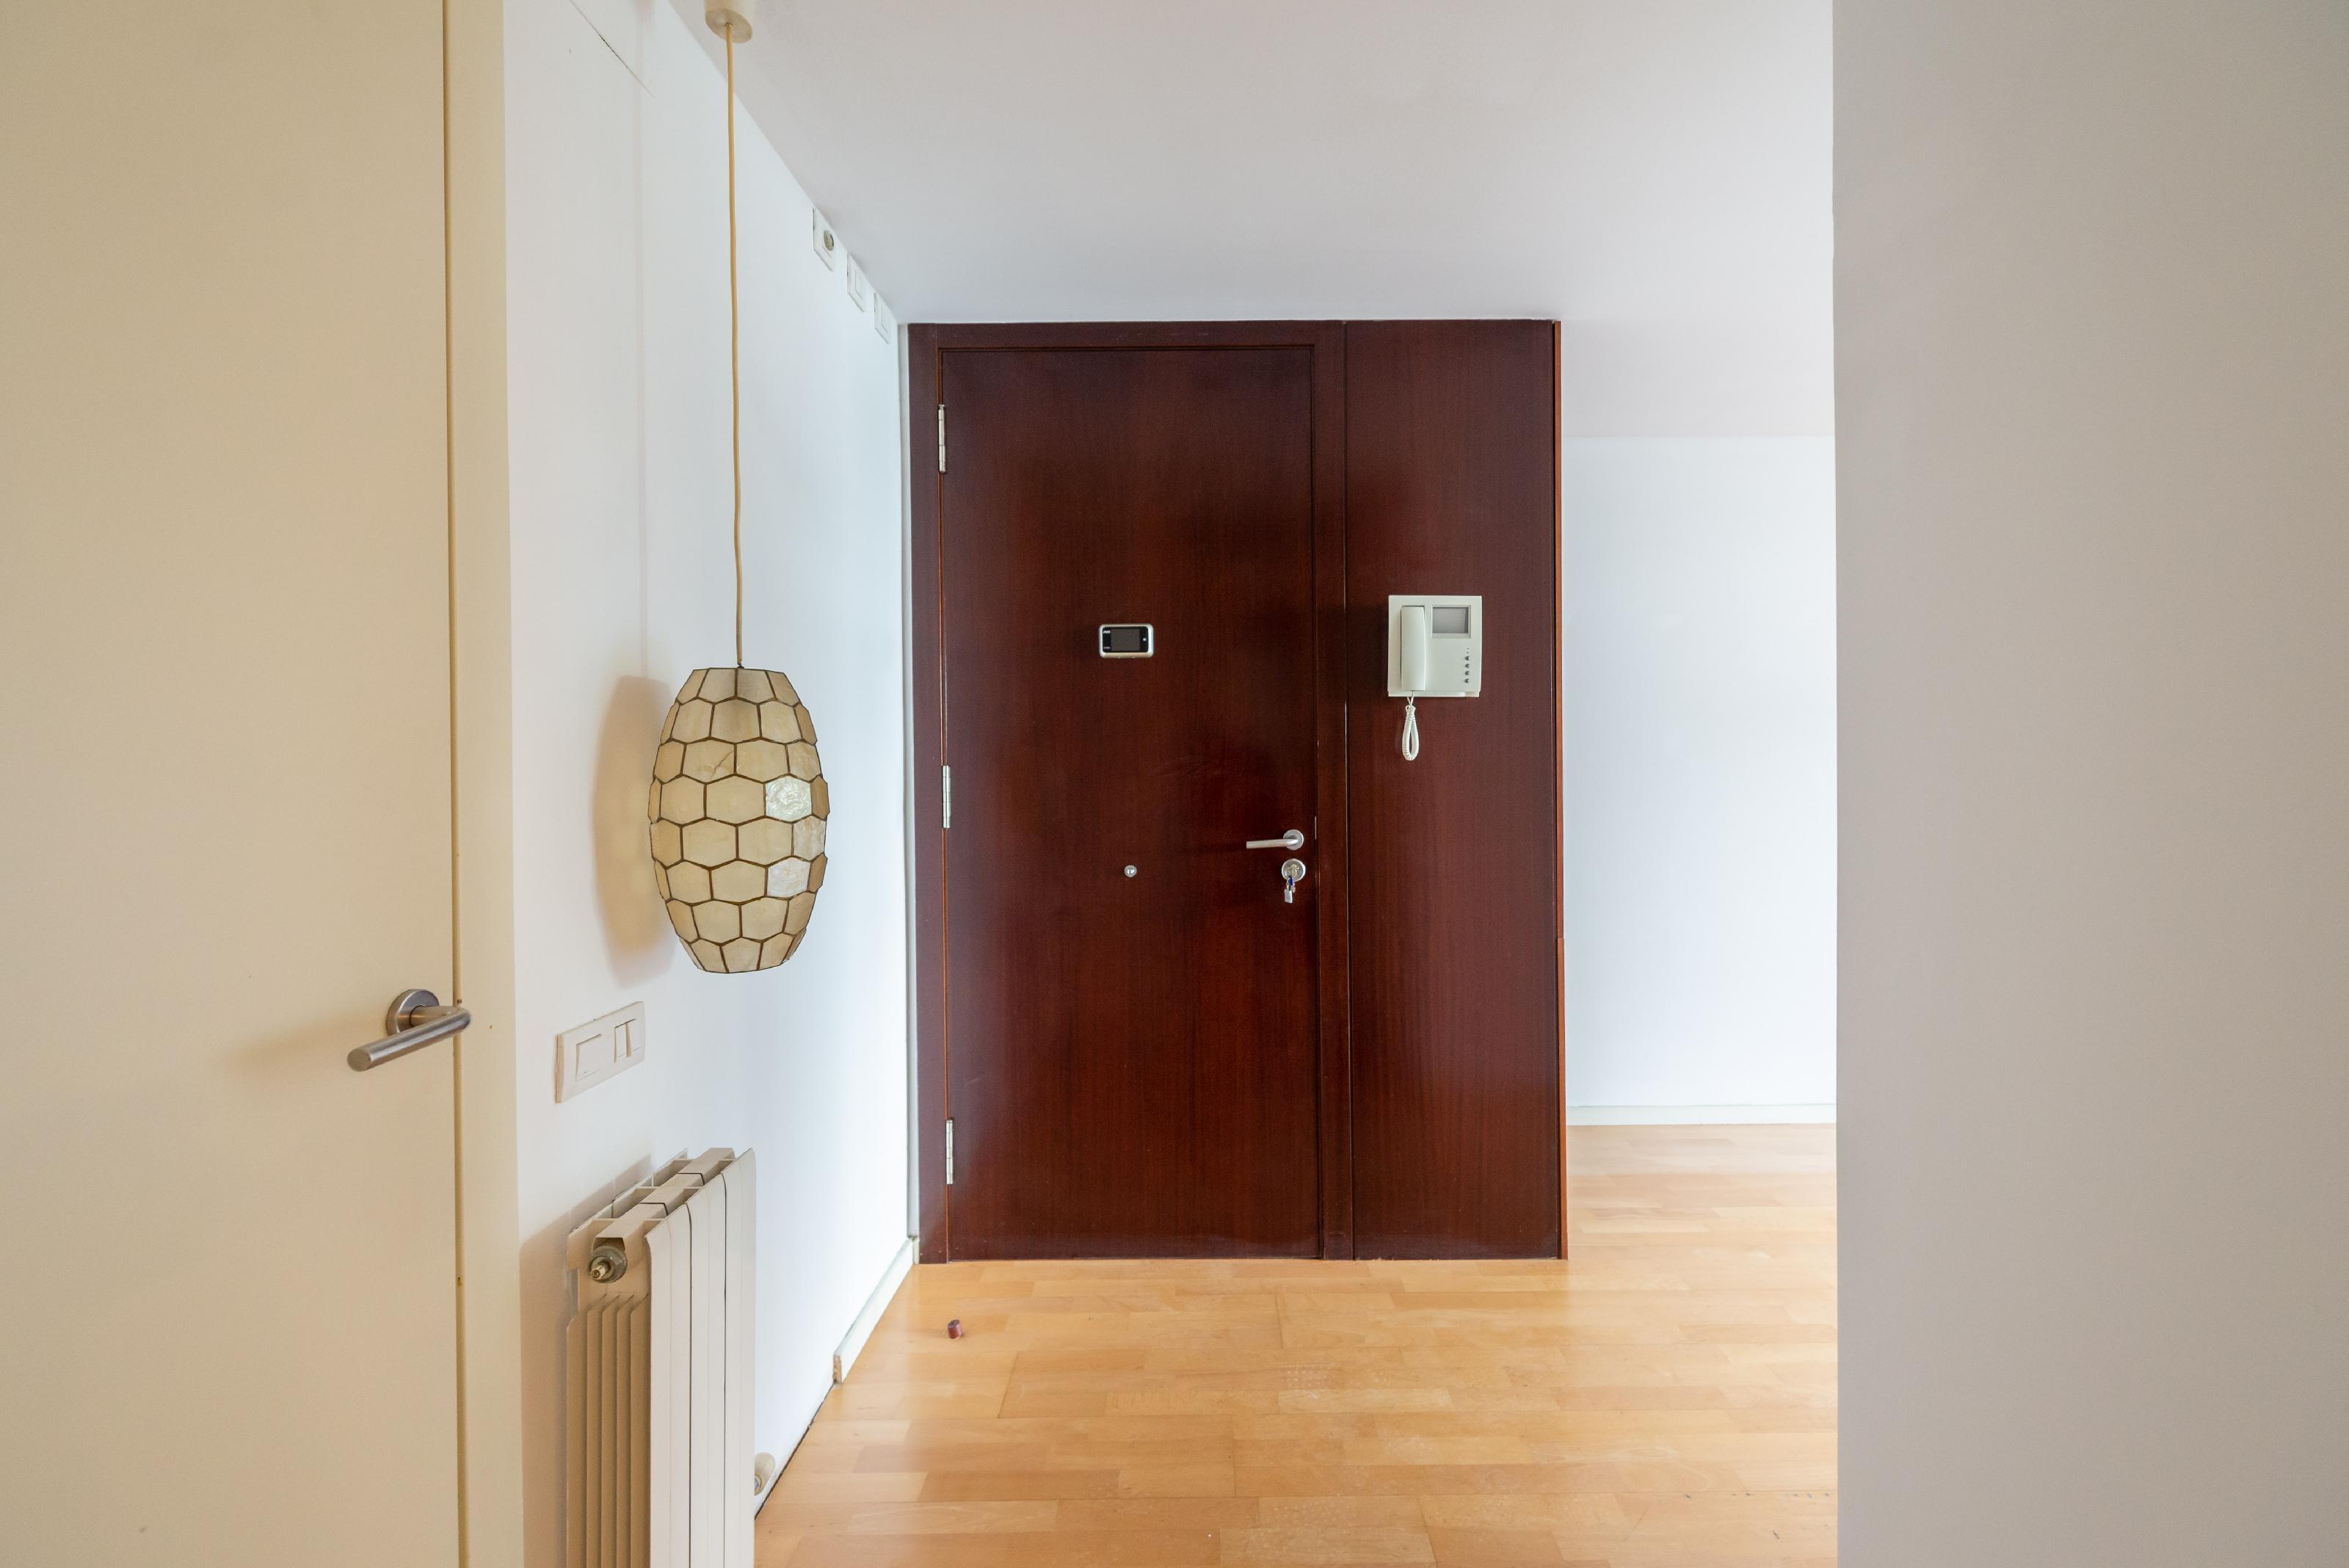 251446 Flat for sale in Sarrià-Sant Gervasi, Tres Torres 6